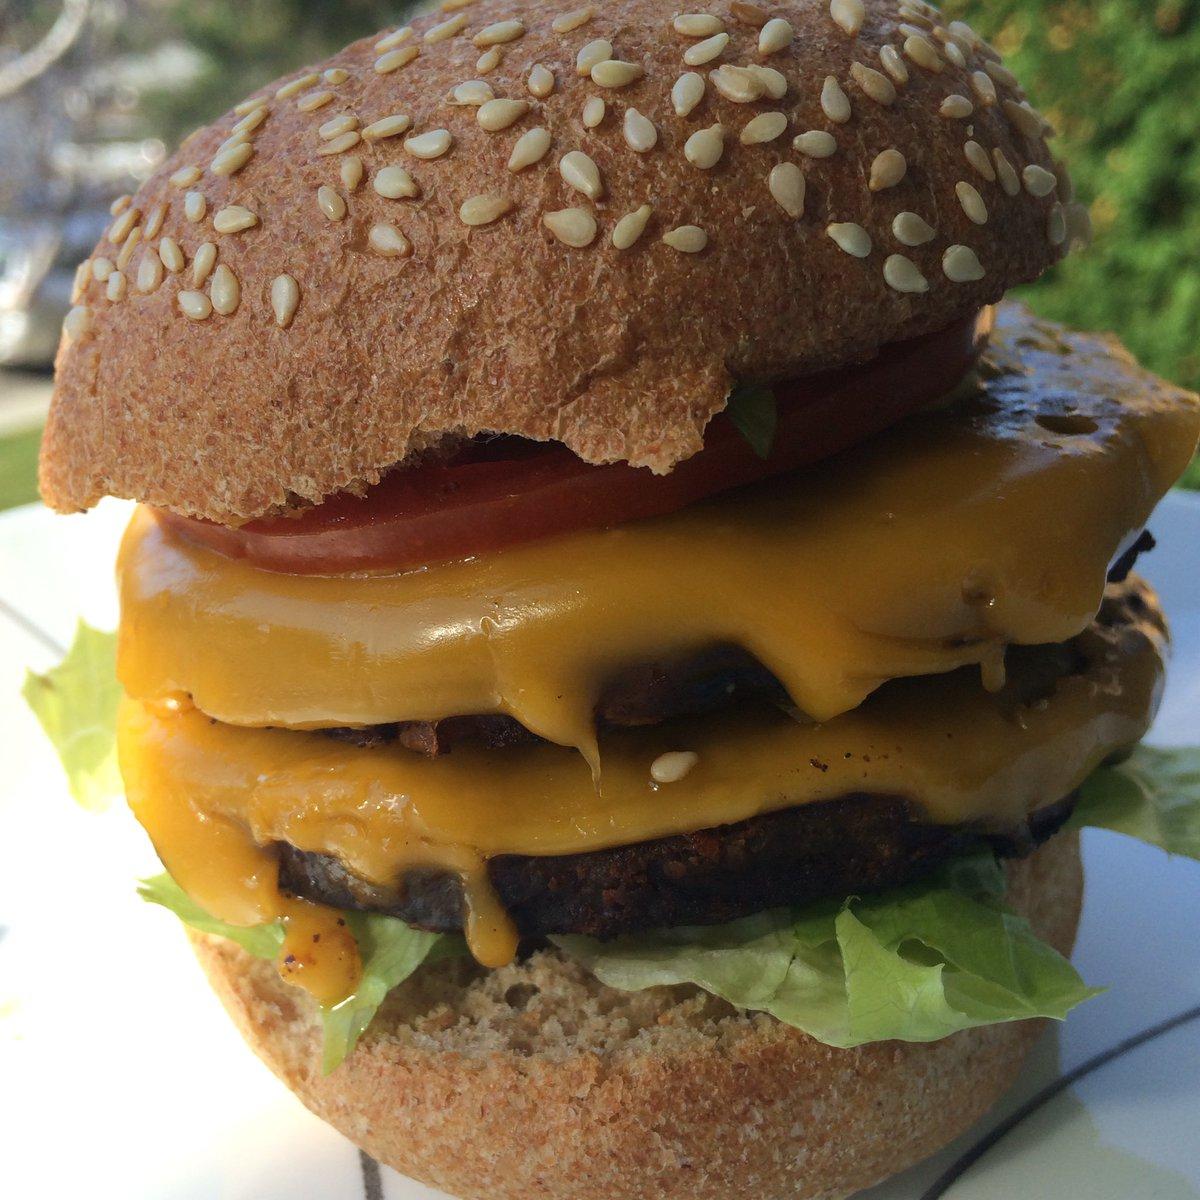 It's national double cheeseburger day @gardein @FollowYourHeart @Silver_Hills #vegan #vegansnackdown #saladnotsalad https://t.co/bCCJpbLyRk